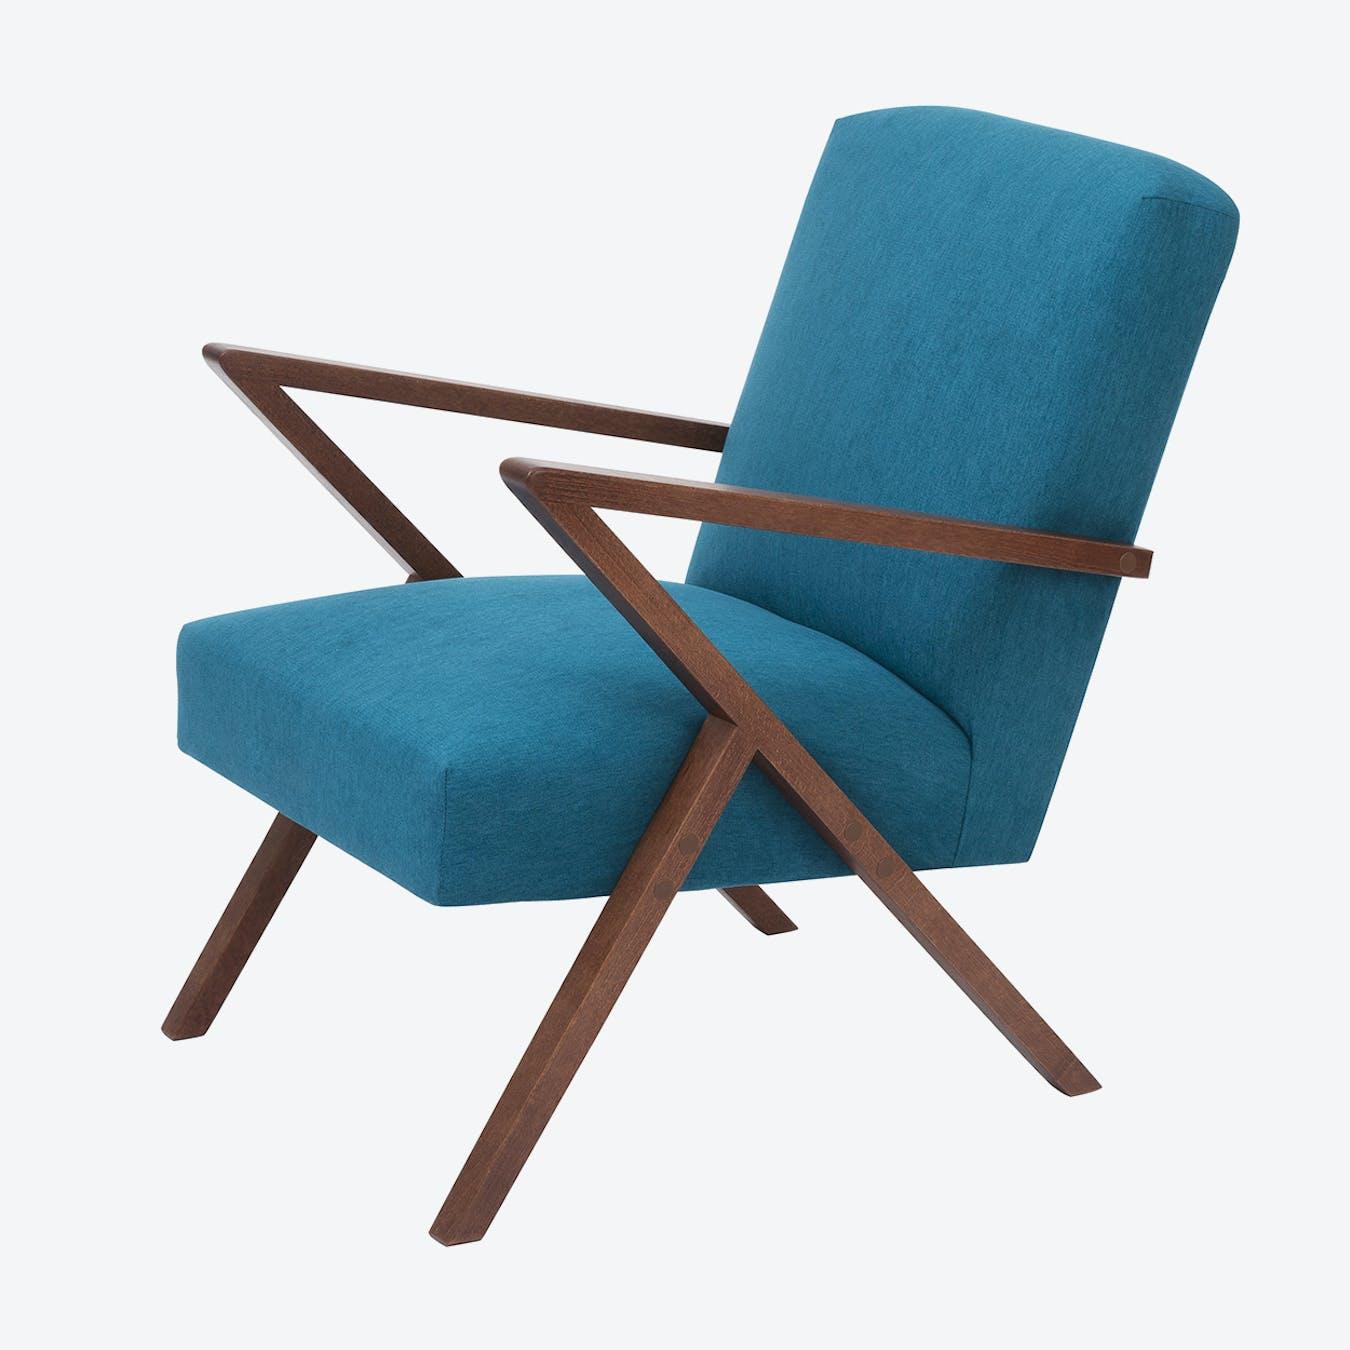 Retrostar Chair - Basic Line in Turquoise